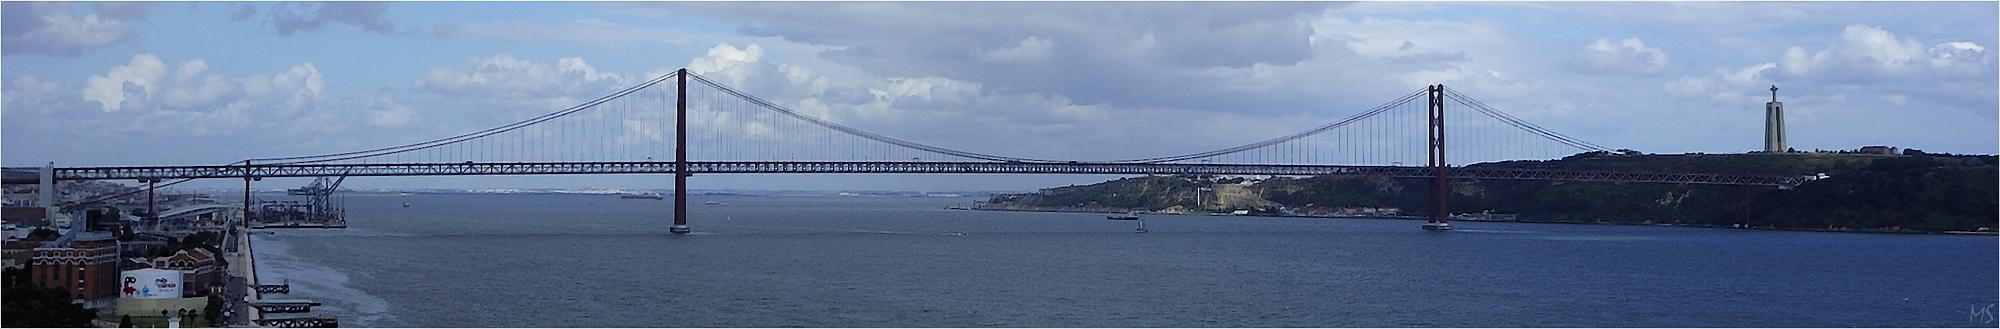 Brücke des 25. April